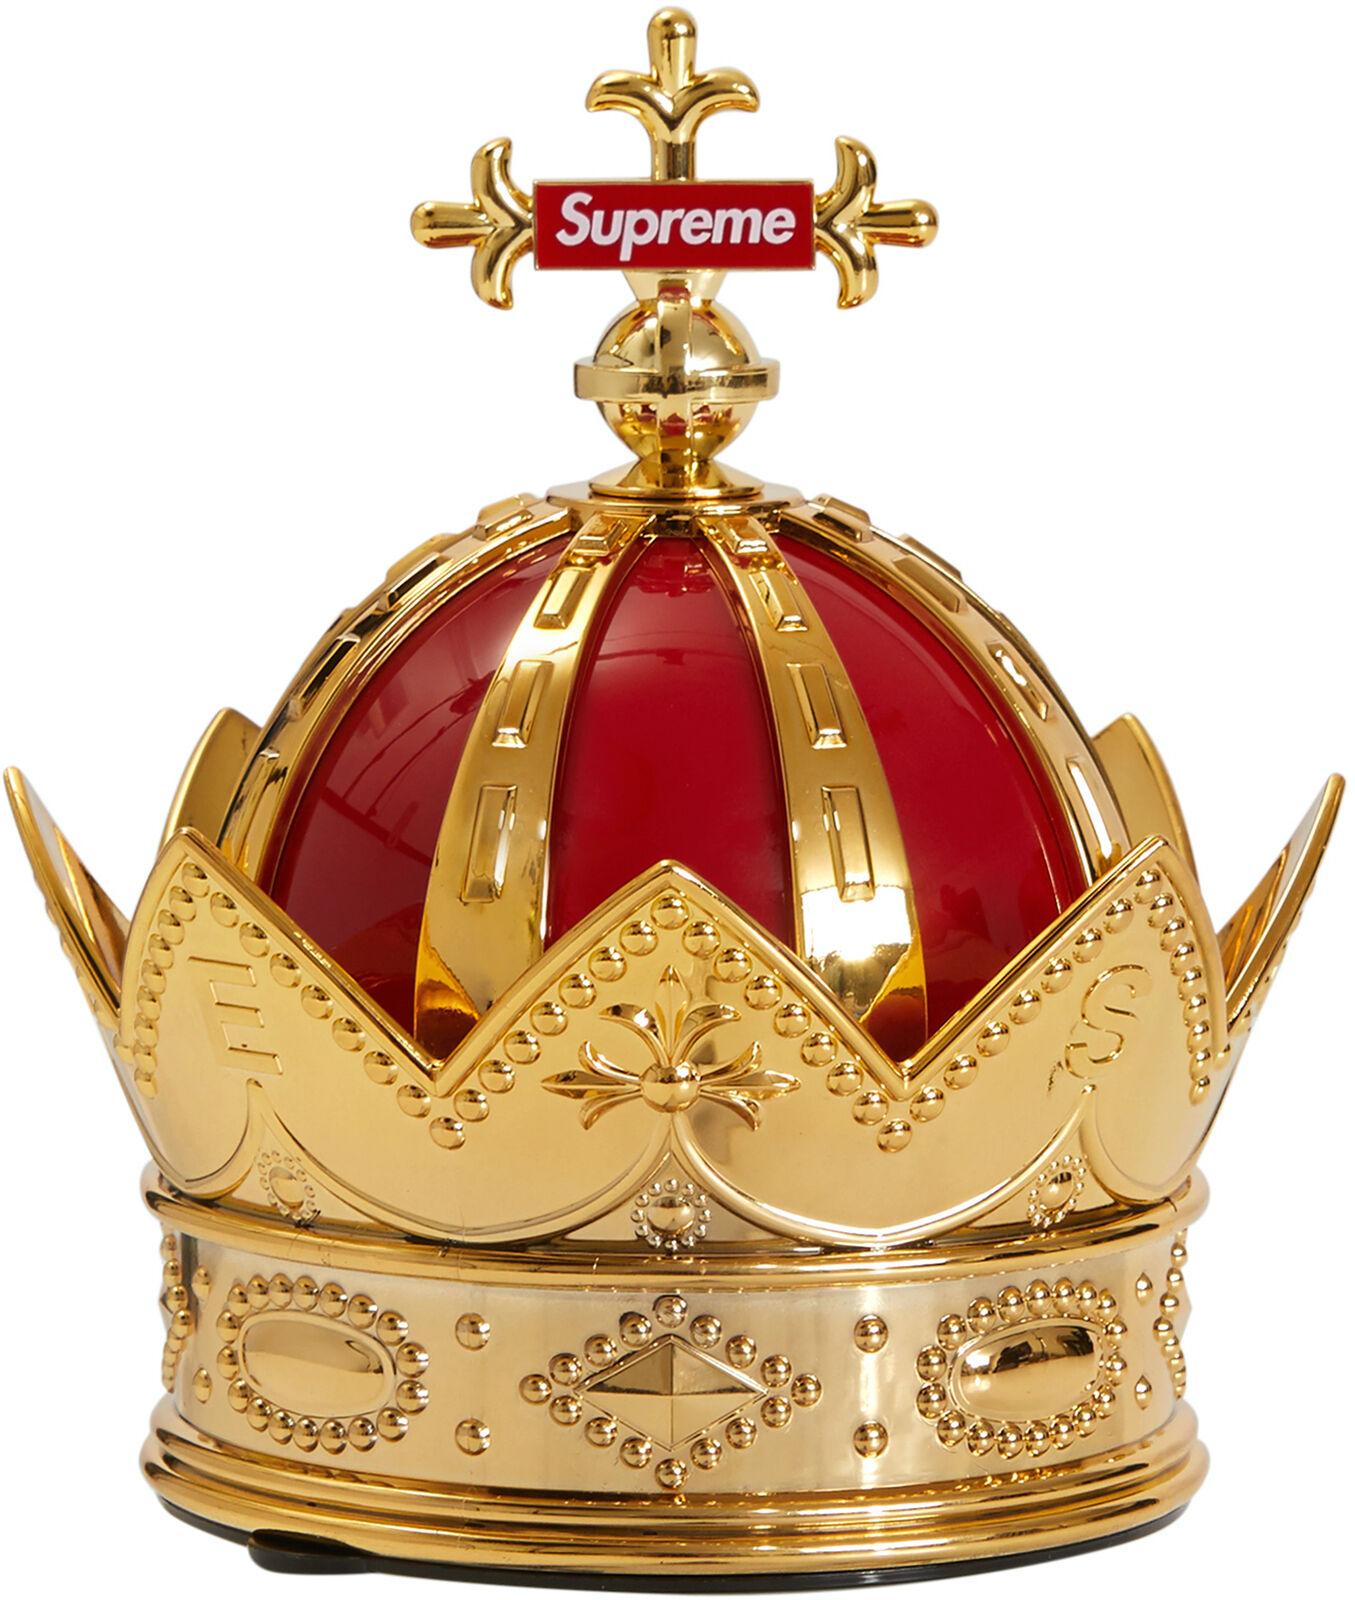 Supreme Crown Air Freshener Black Cherry Red Gold SS19